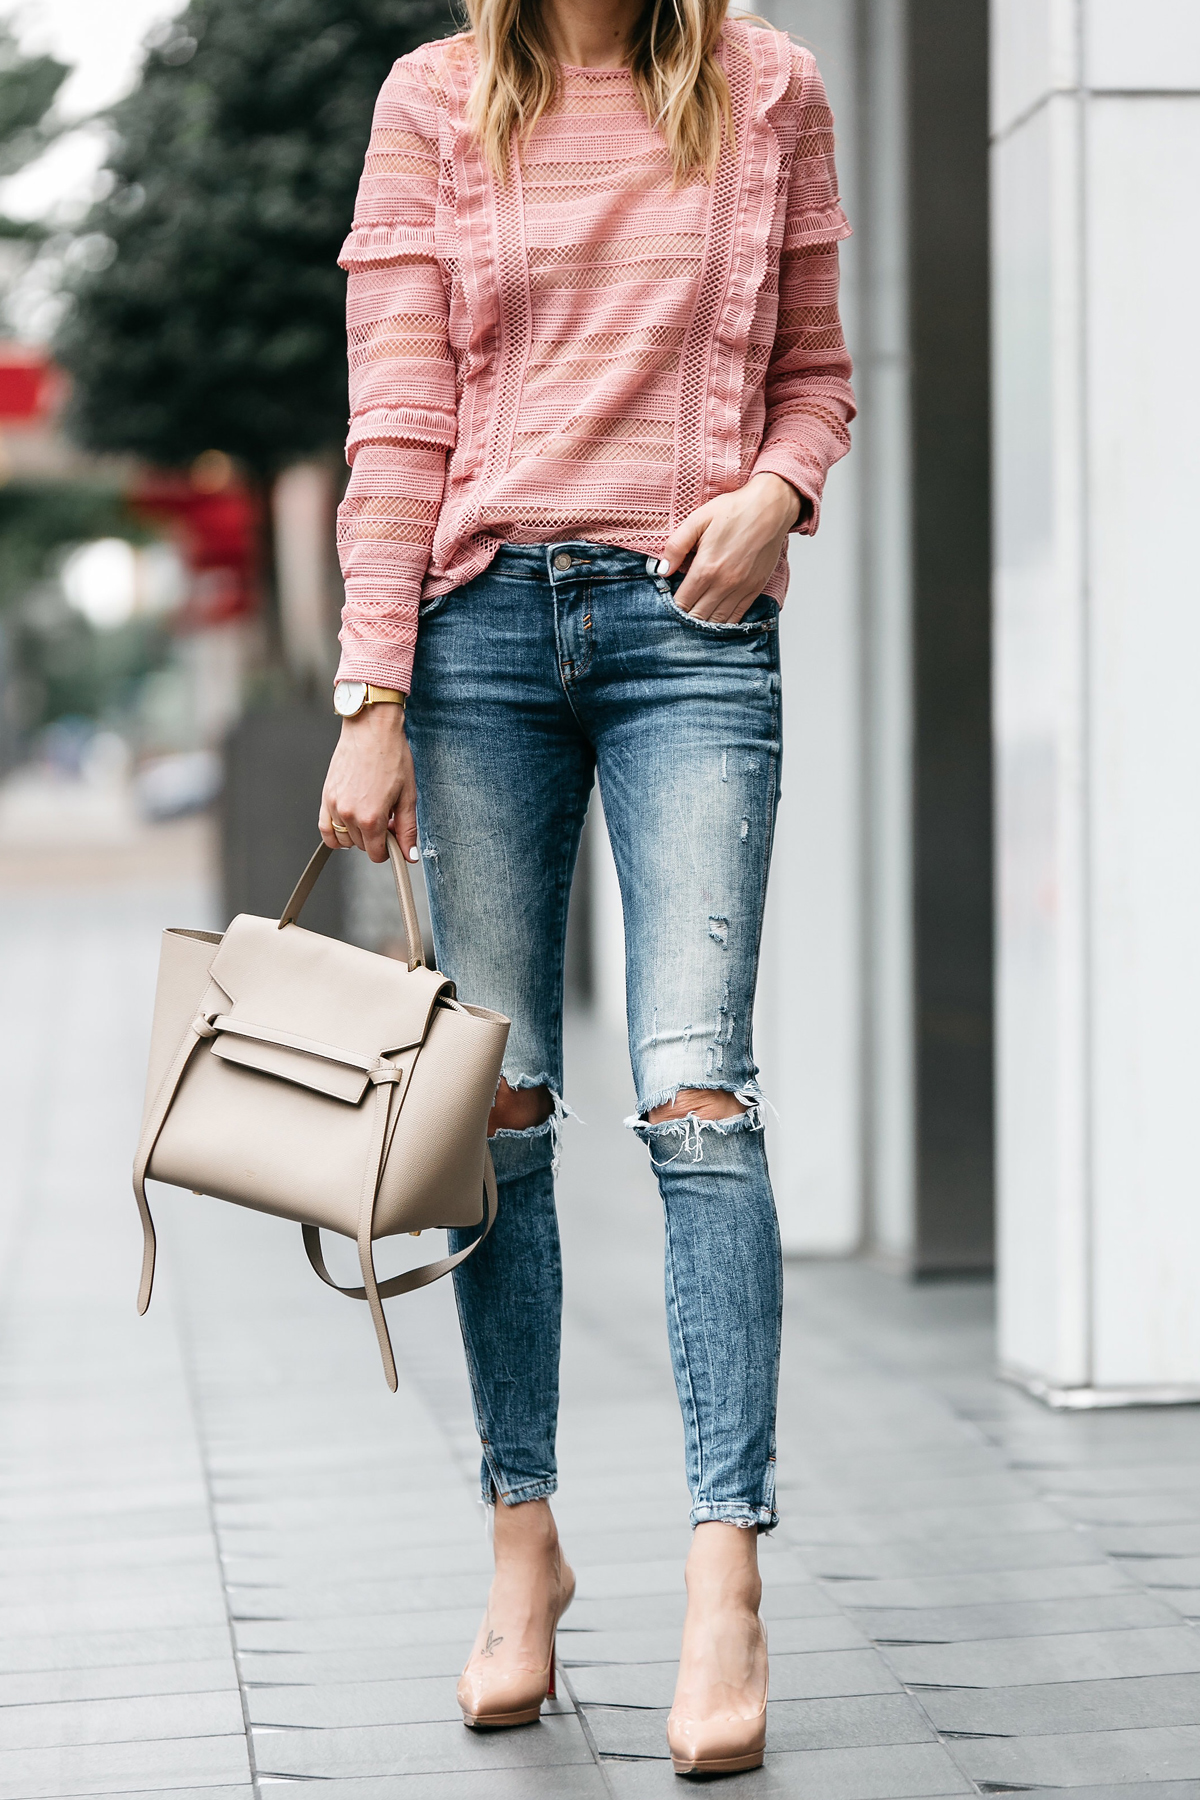 Fashion Jackson, Dallas Blogger, Fashion Blogger, Street Style, Self-Portrait Pink Lace Top, Denim Ripped Skinny Jeans, Christian Louboutin Pigalle Nude Pumps, Celine Belt Bag, Karen Walker Sunglasses